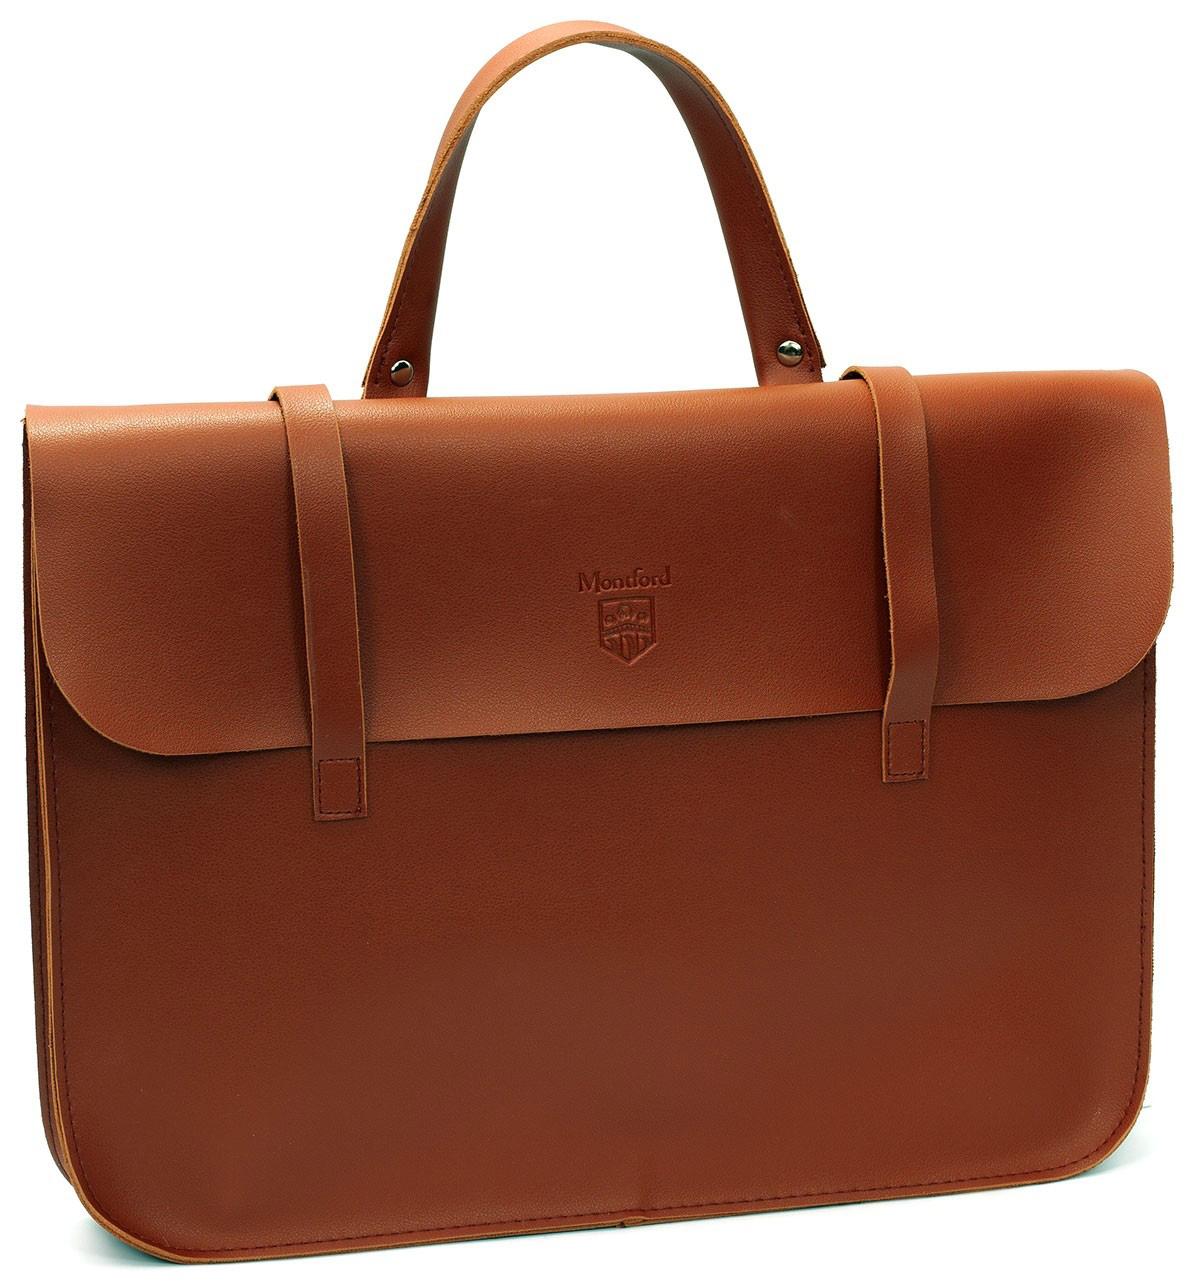 Music Case Bag Tan: Case